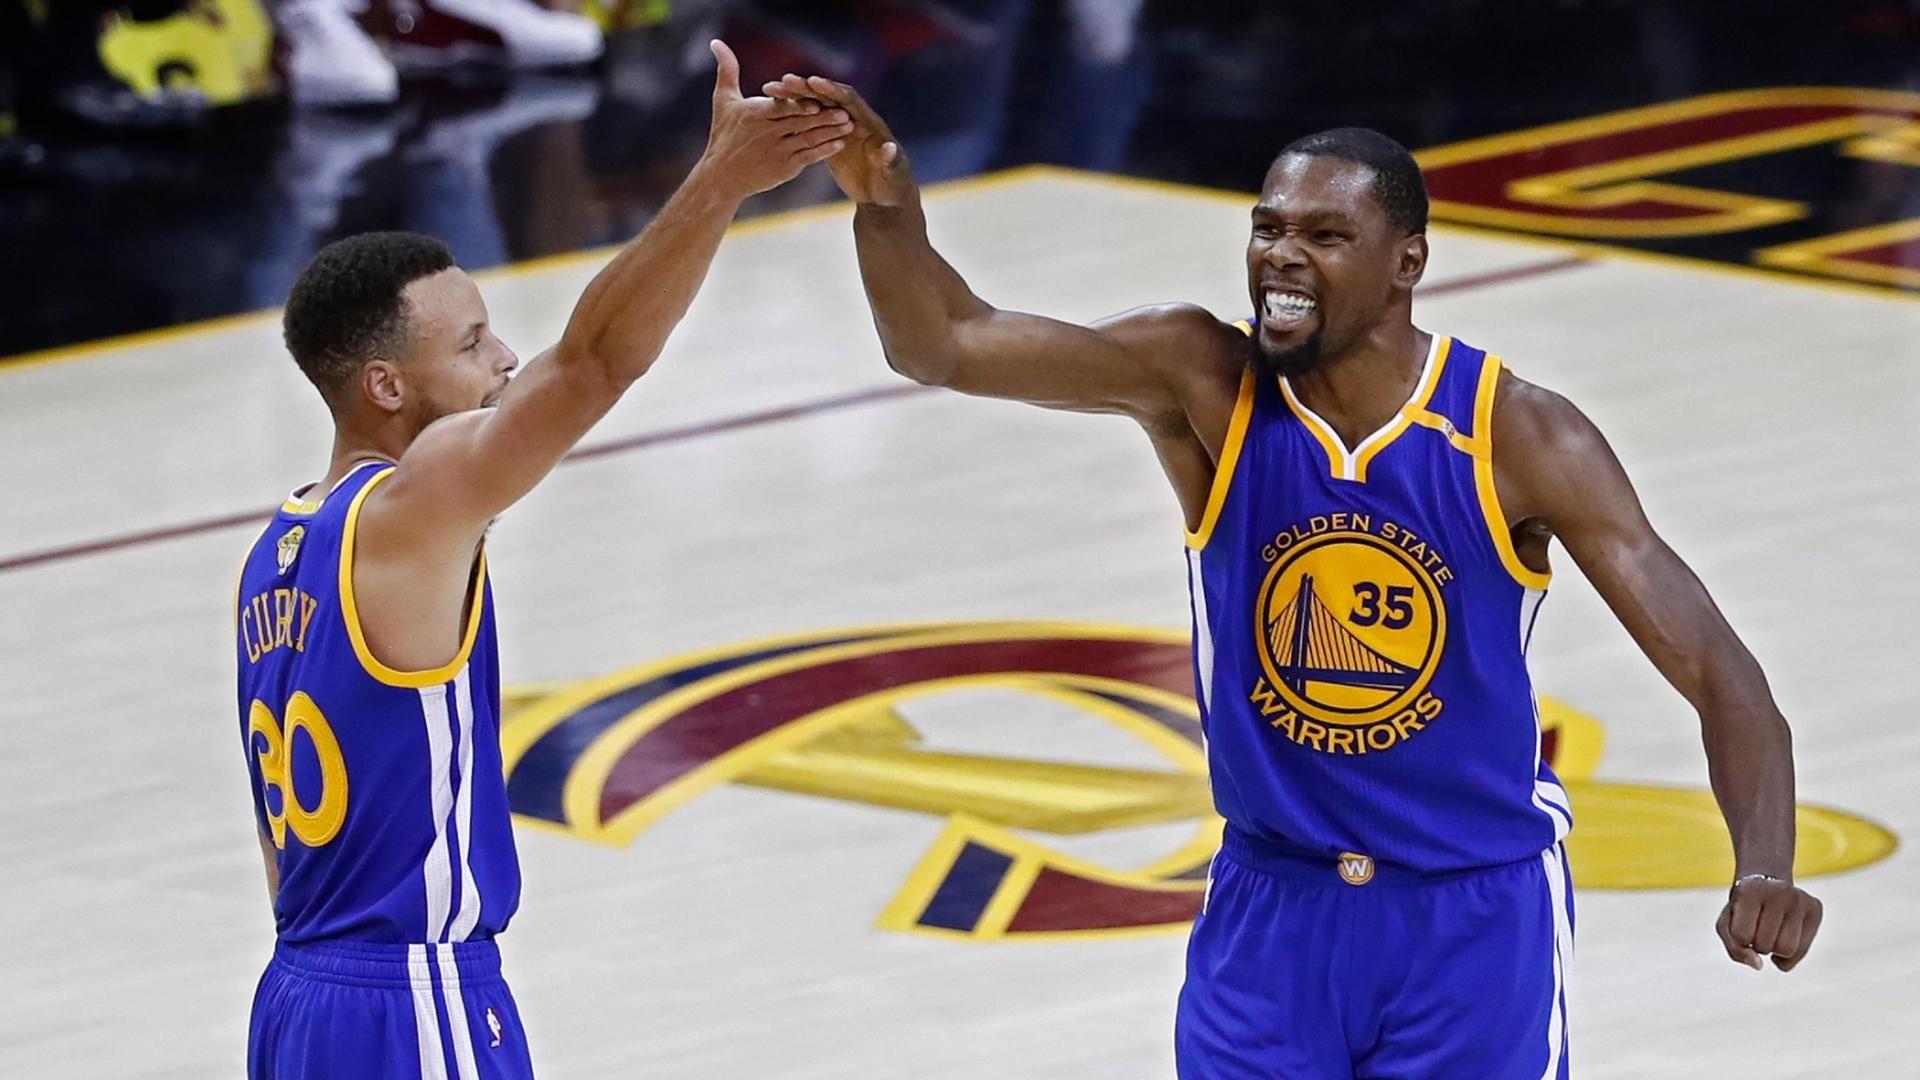 https://secure.espncdn.com/combiner/i?img=/media/motion/2017/0608/dm_170608_NBA__Cavs_Warriors_Highlight327/dm_170608_NBA__Cavs_Warriors_Highlight327.jpg